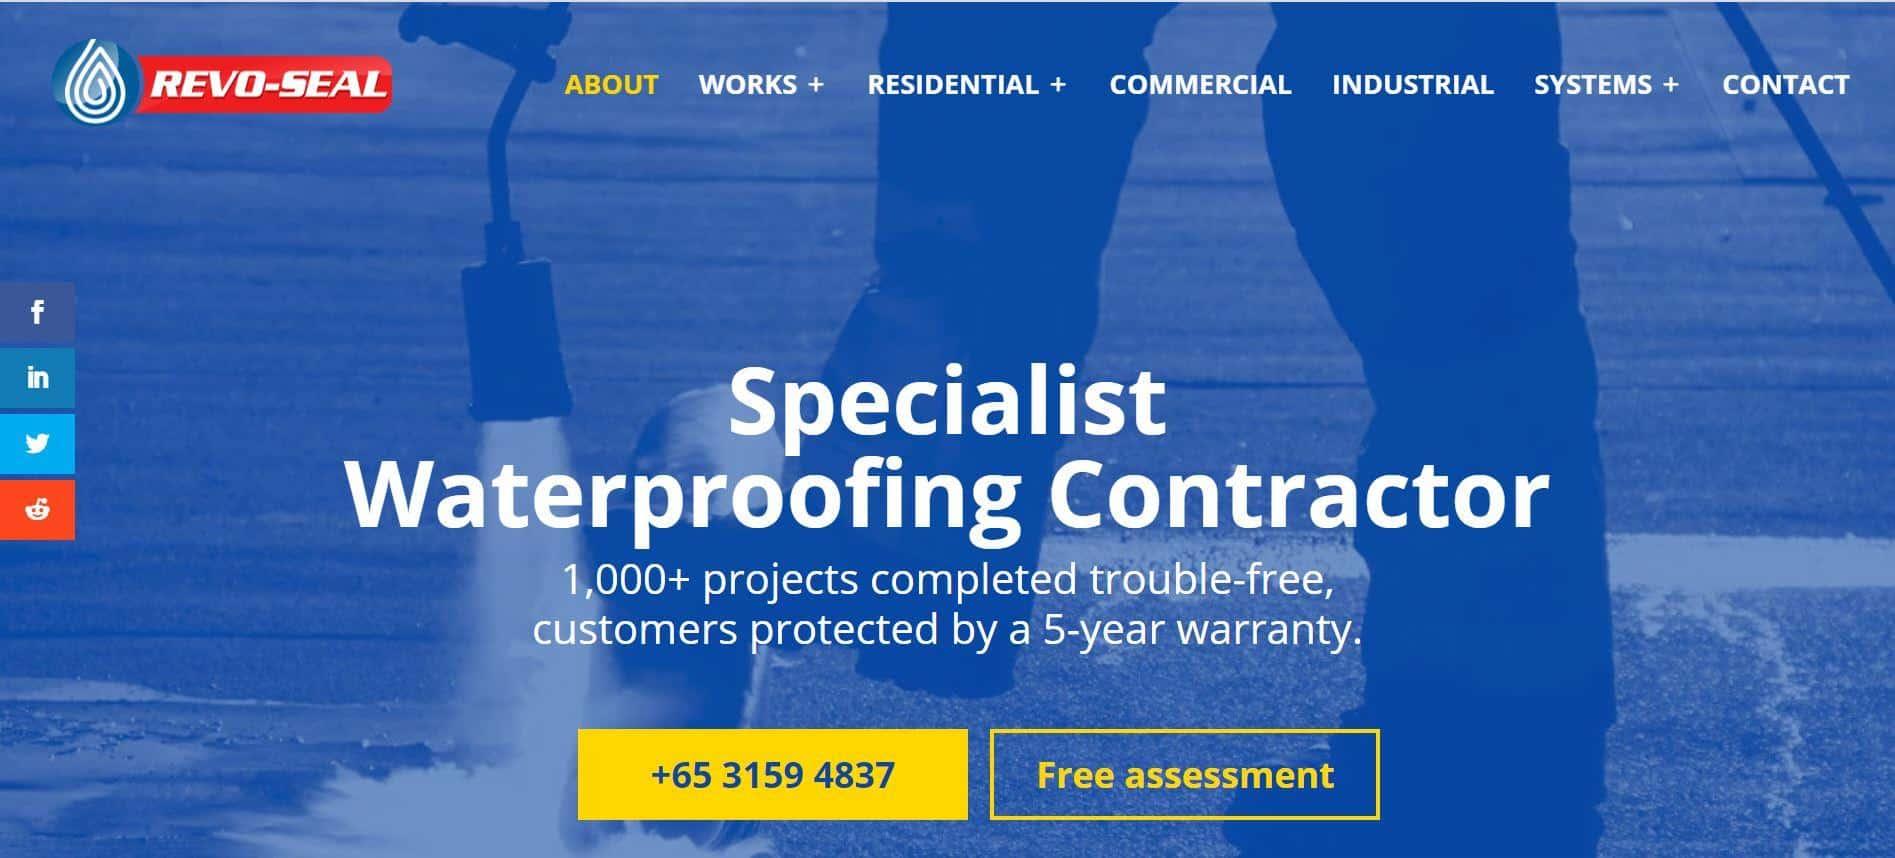 Revo-seal Waterproofing is 10 Best Waterproofing Contractors in Singapore, Waterproofing Company In Singapore With Prices, best Waterproofing Contractor Singapore, Waterproofing Contractor Singapore Specialist,  top and leading specialist waterproofing contractor in Singapore,